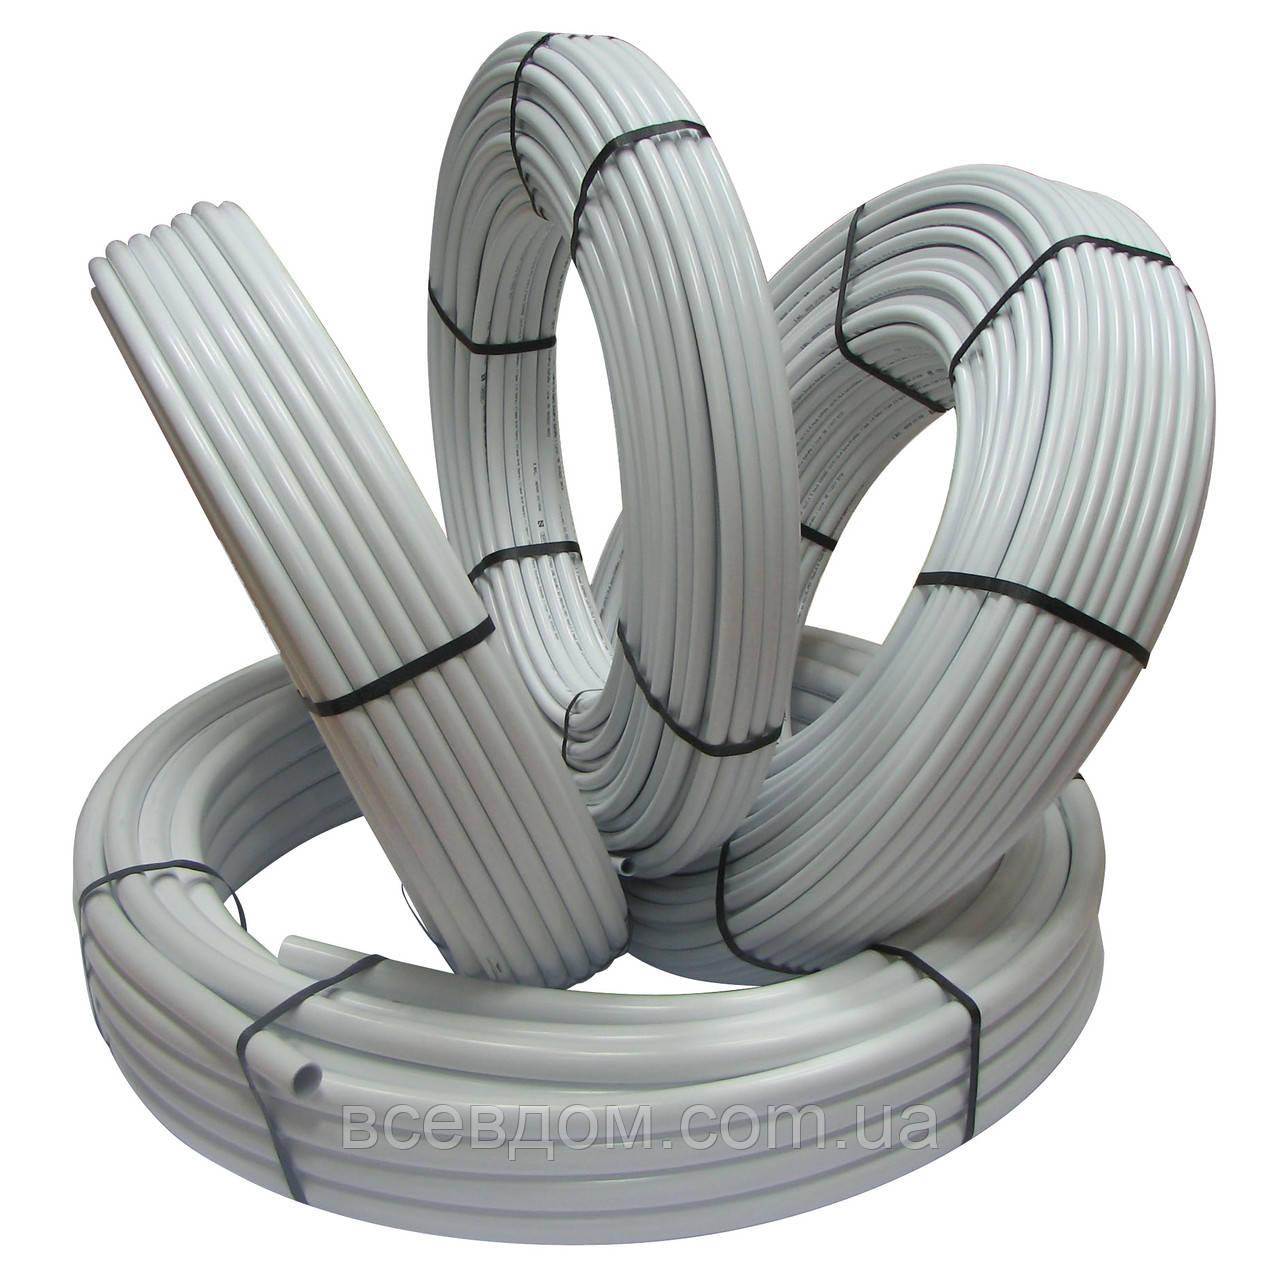 Труба металлопластиковая бесшовная PEXAL 26х2